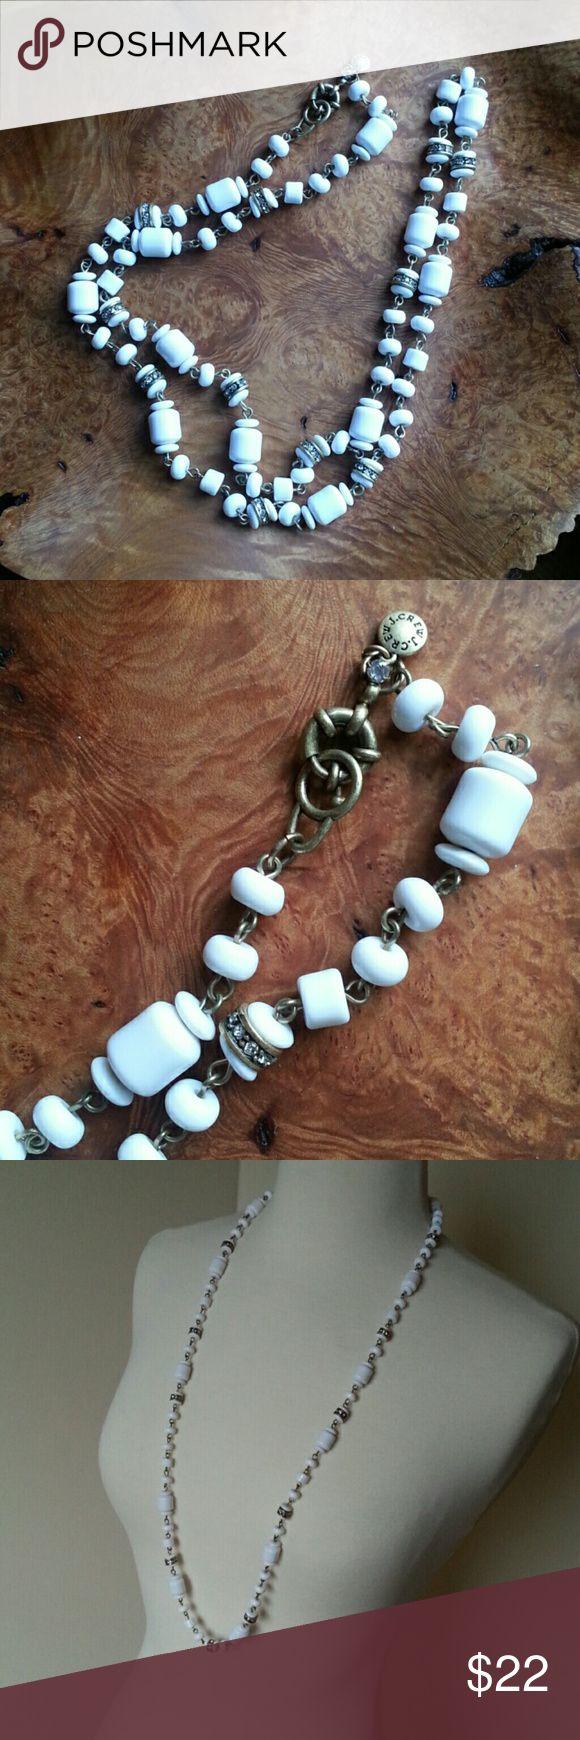 J Crew Necklace J Crew necklace. White beads, rhinestones, antiqued gold color. J Crew Jewelry Necklaces